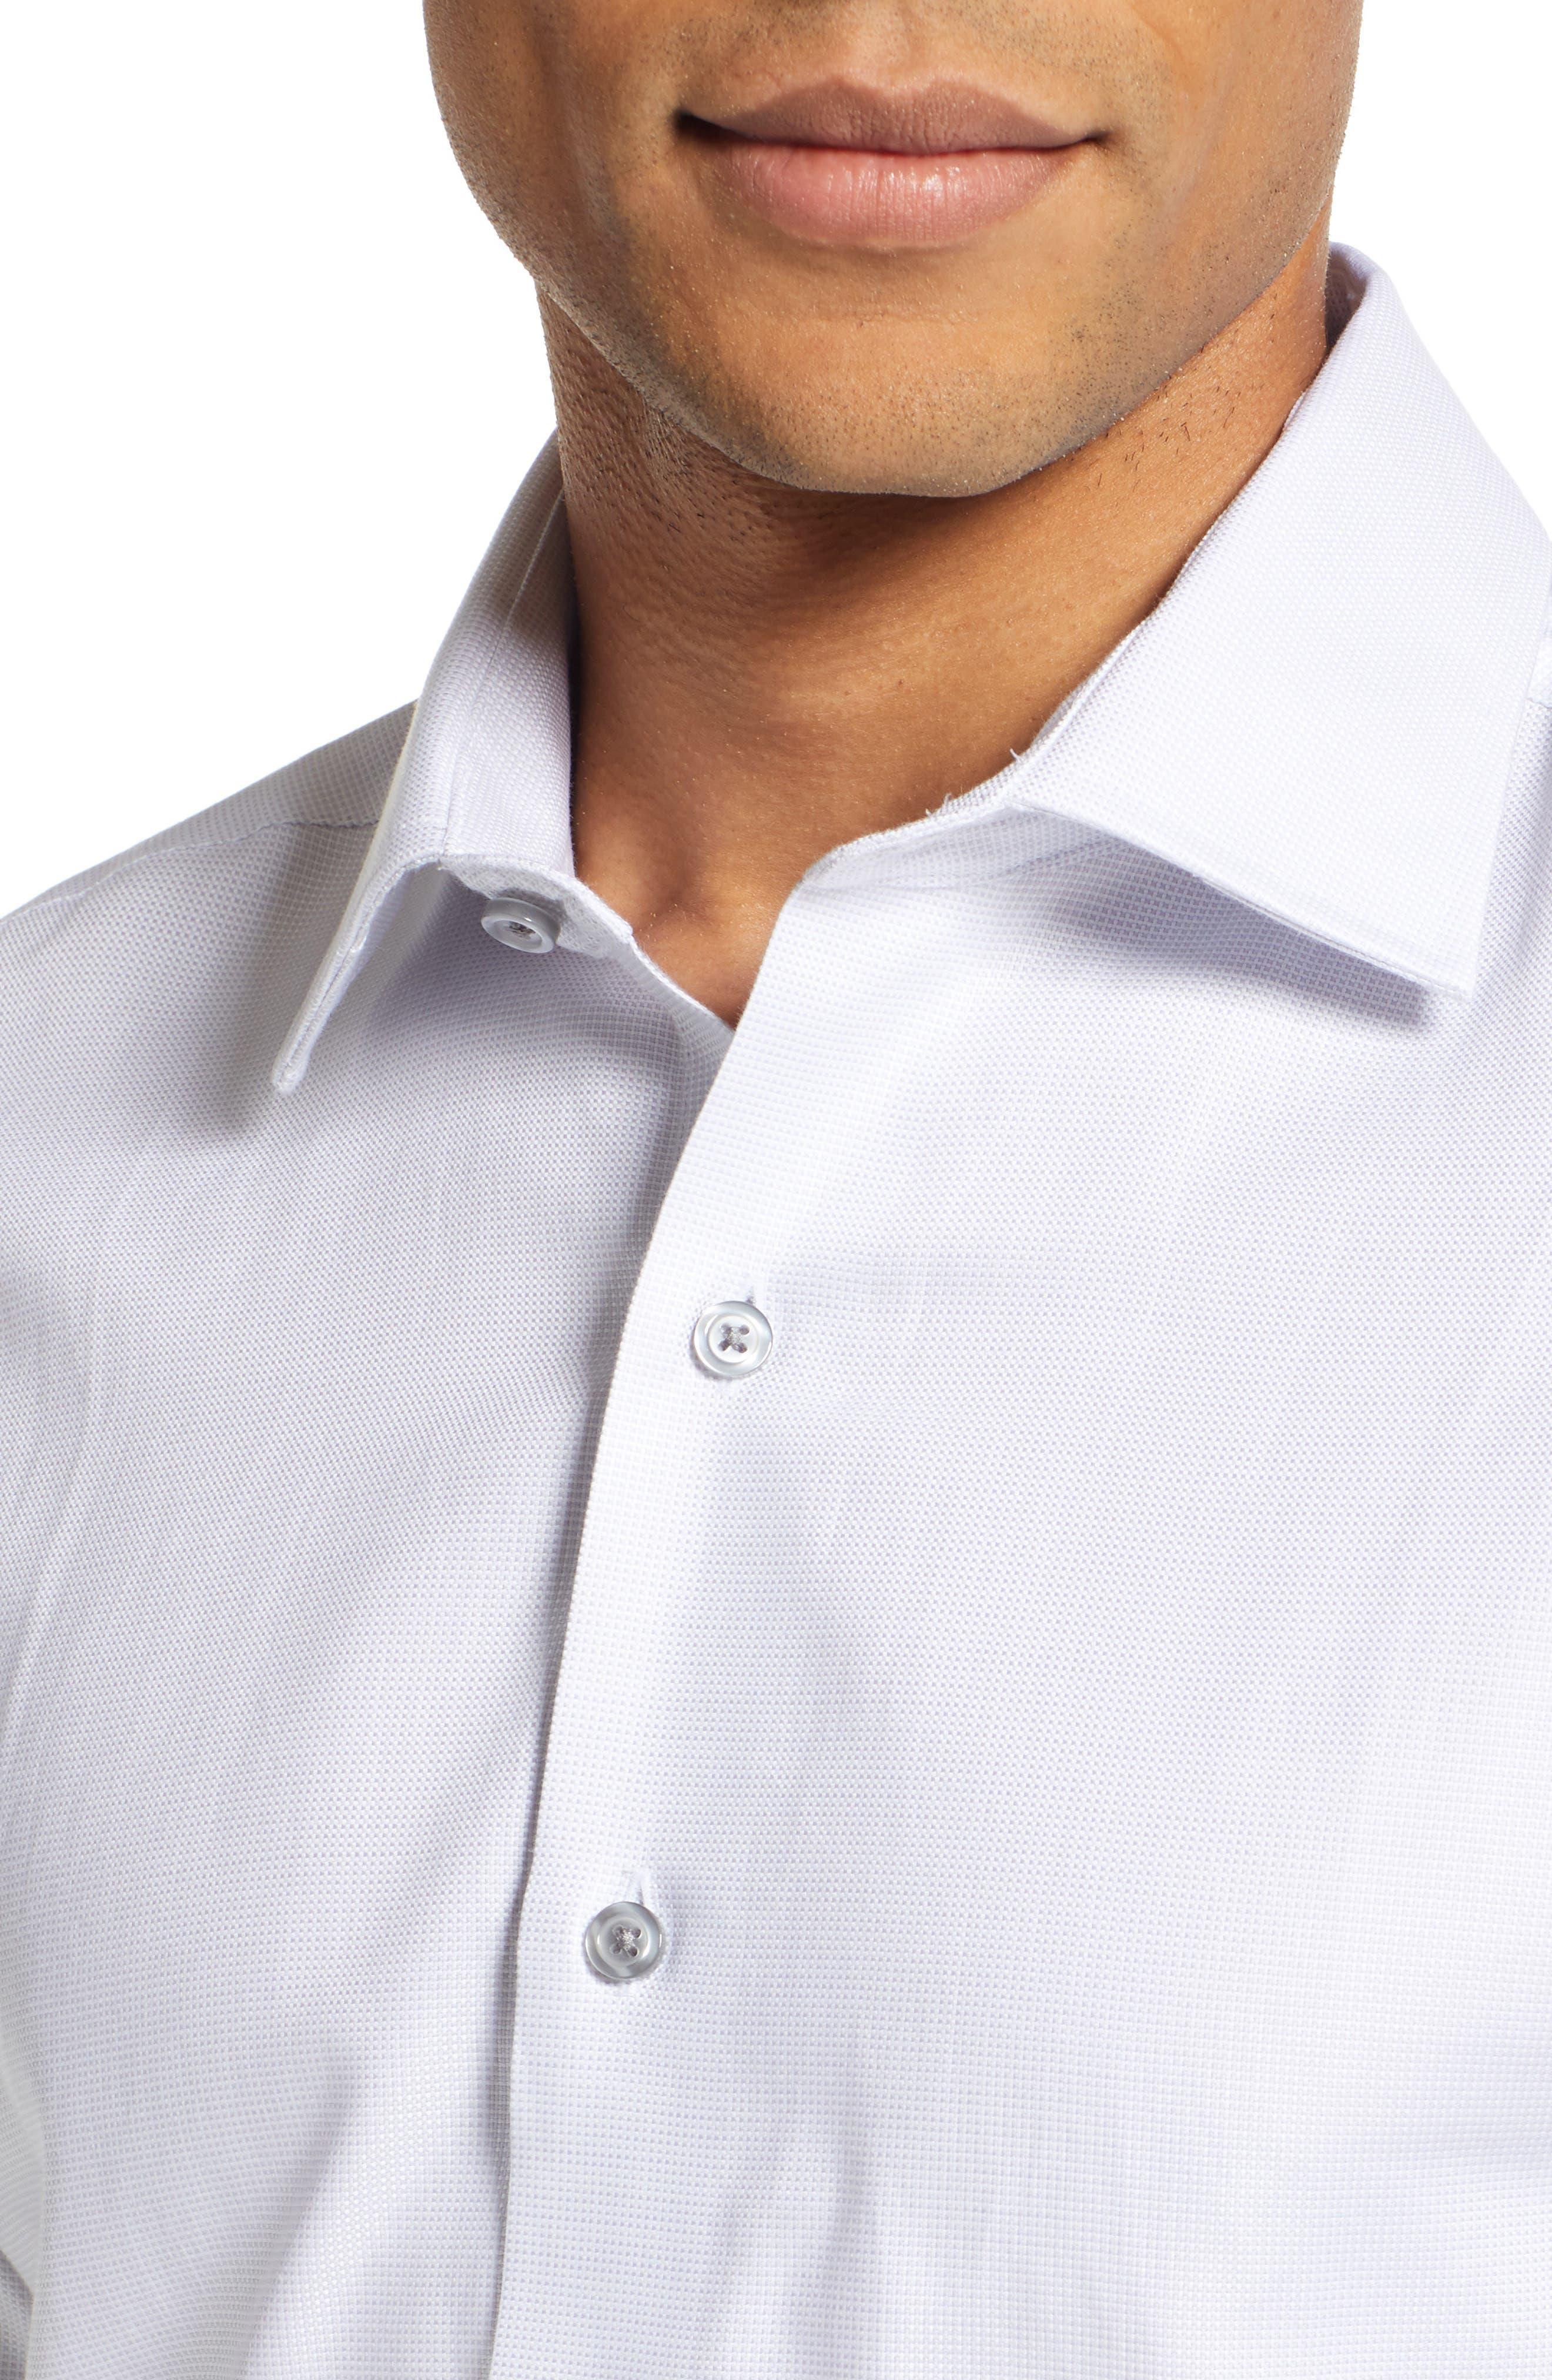 Slim Fit Solid Dress Shirt,                             Alternate thumbnail 2, color,                             GREY DOBBY